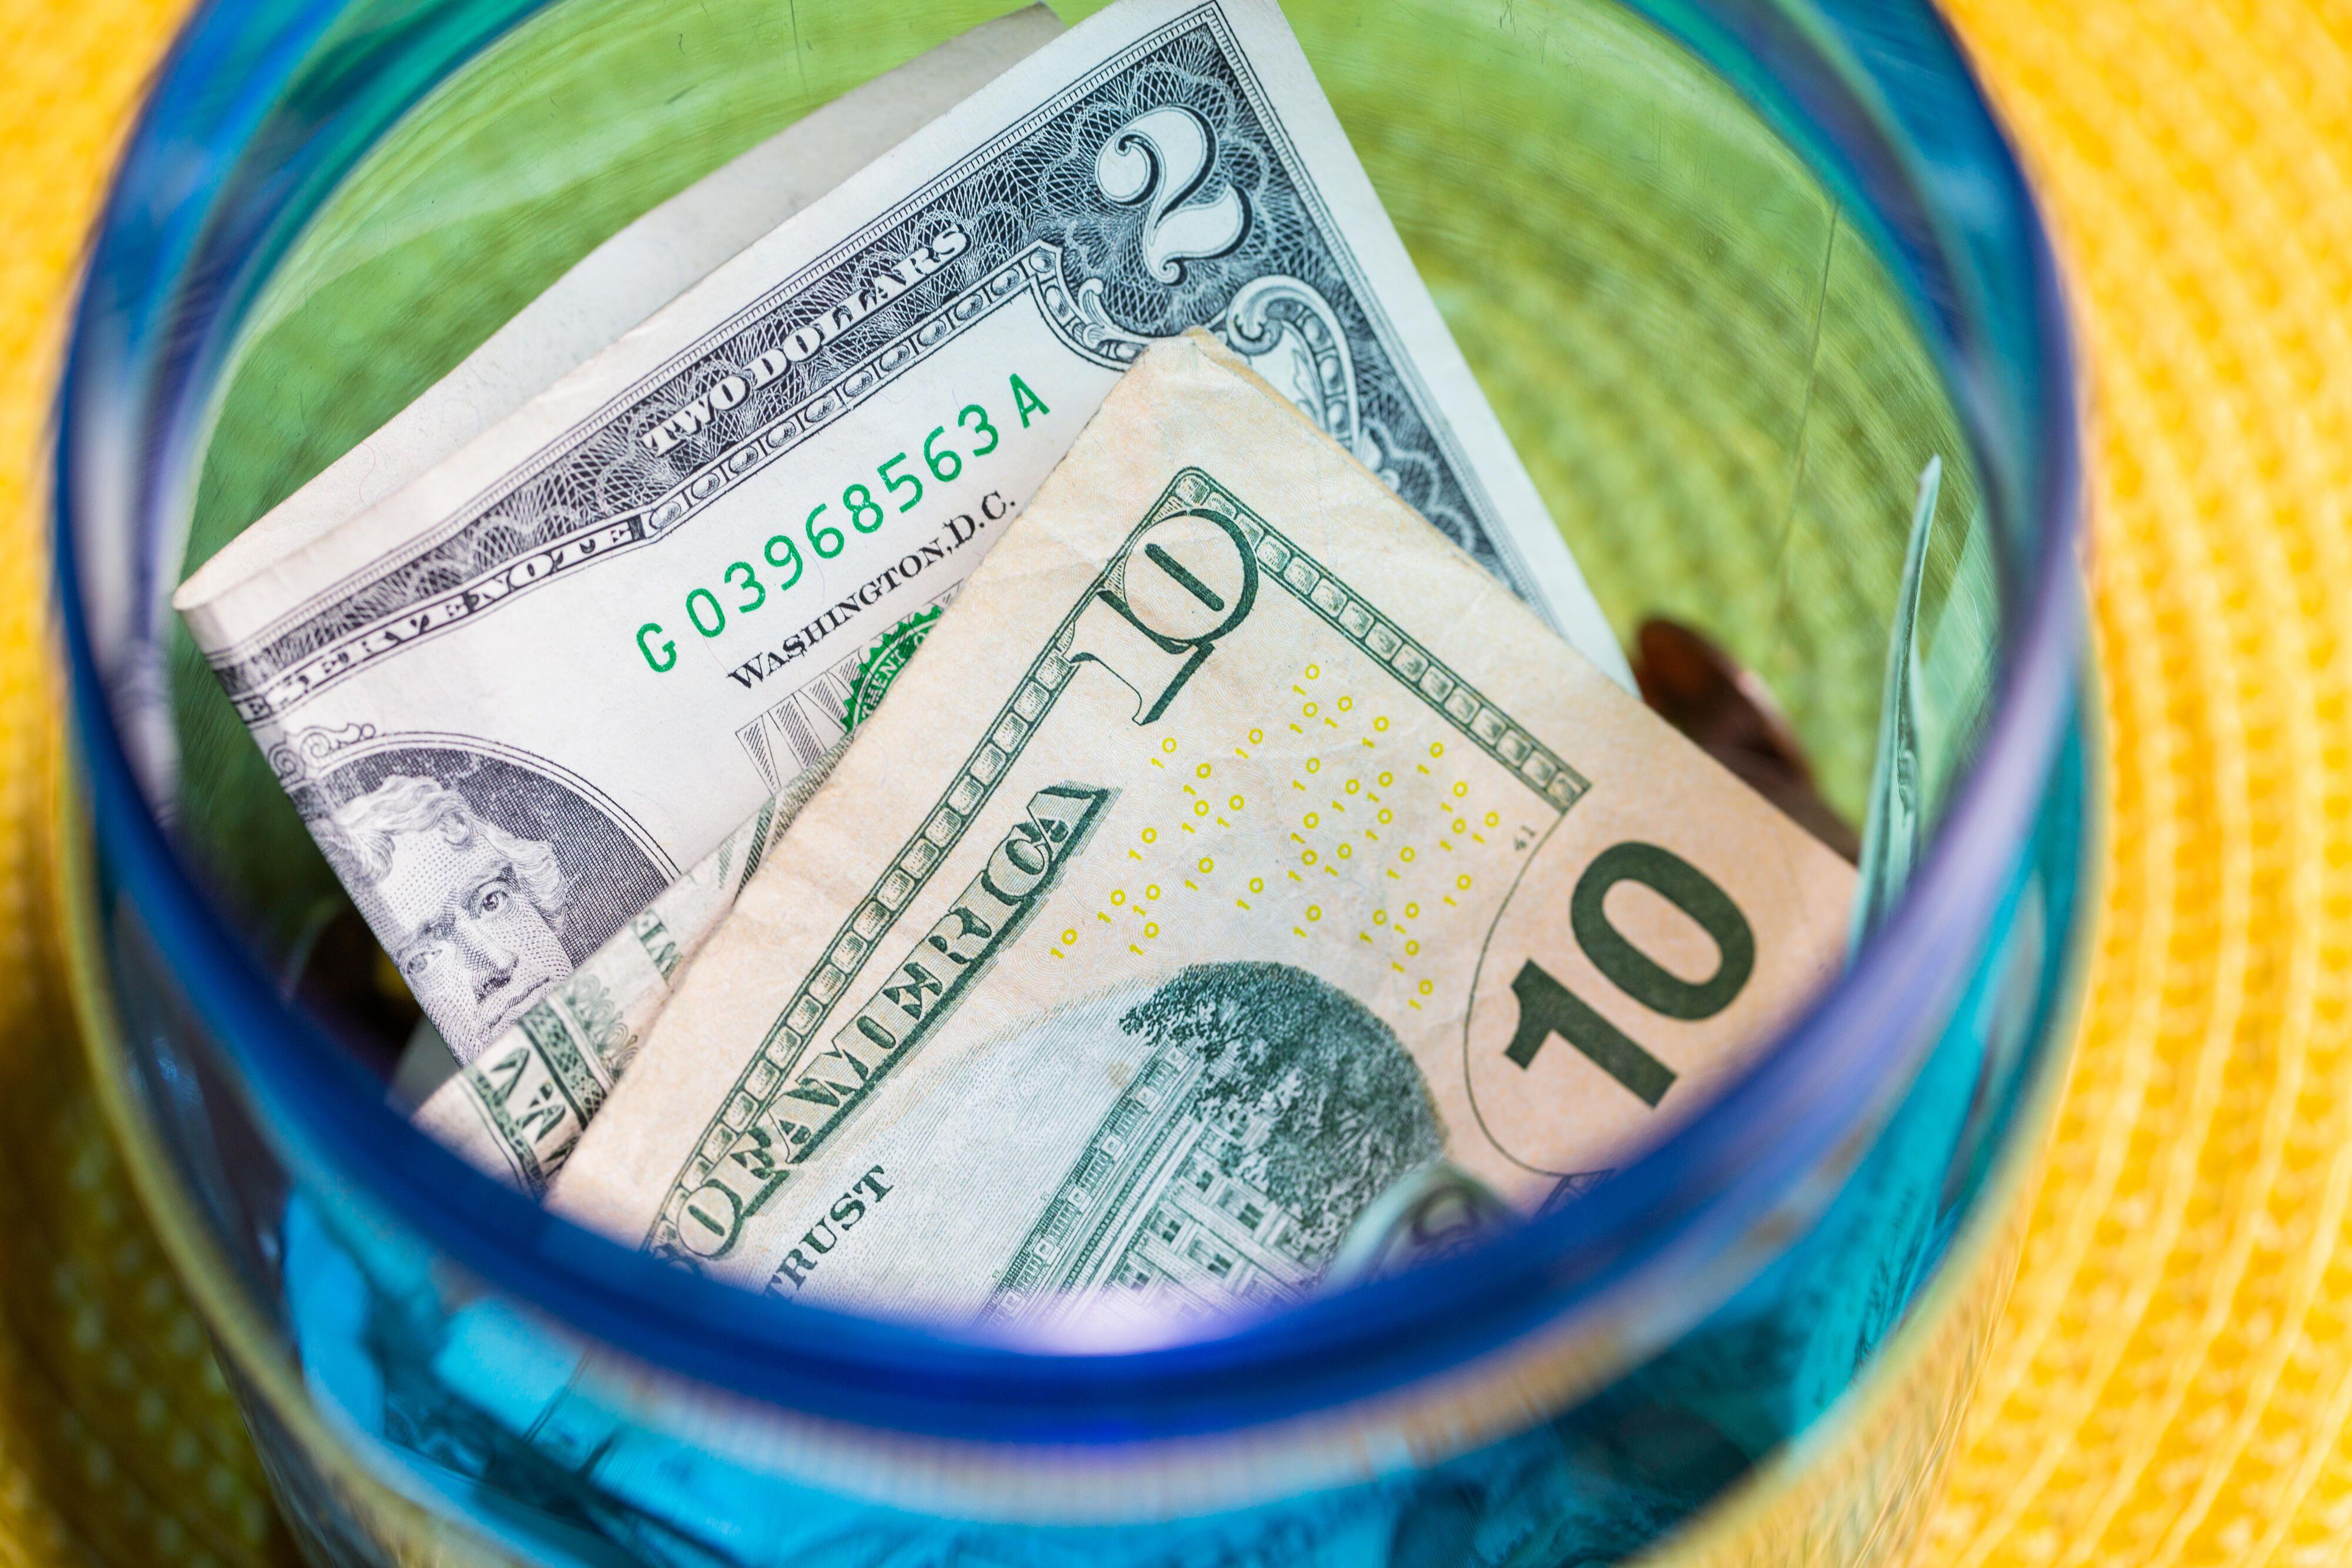 money-cash-dollars-bills-bank-stimulus-covid-finance-7113